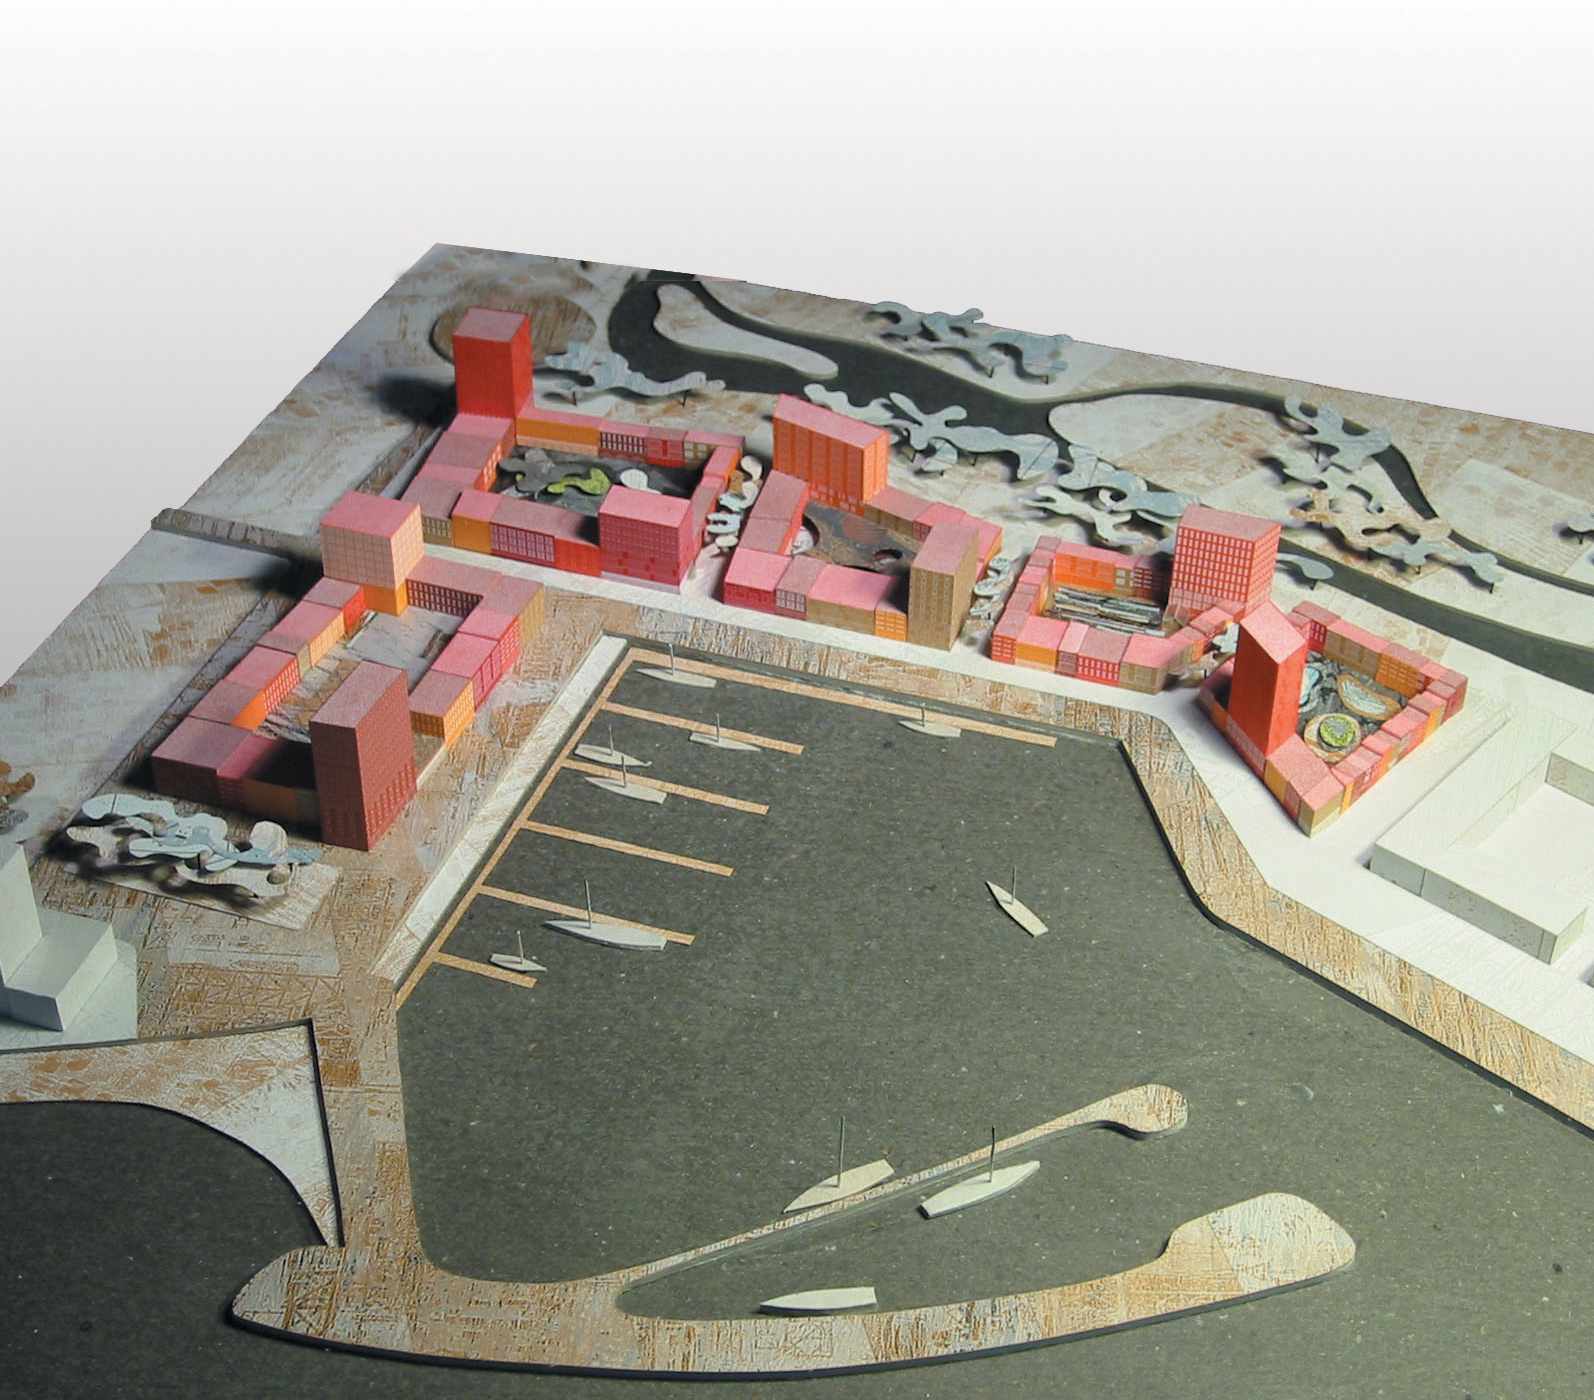 Havenkwartier Lelystad – Maquette